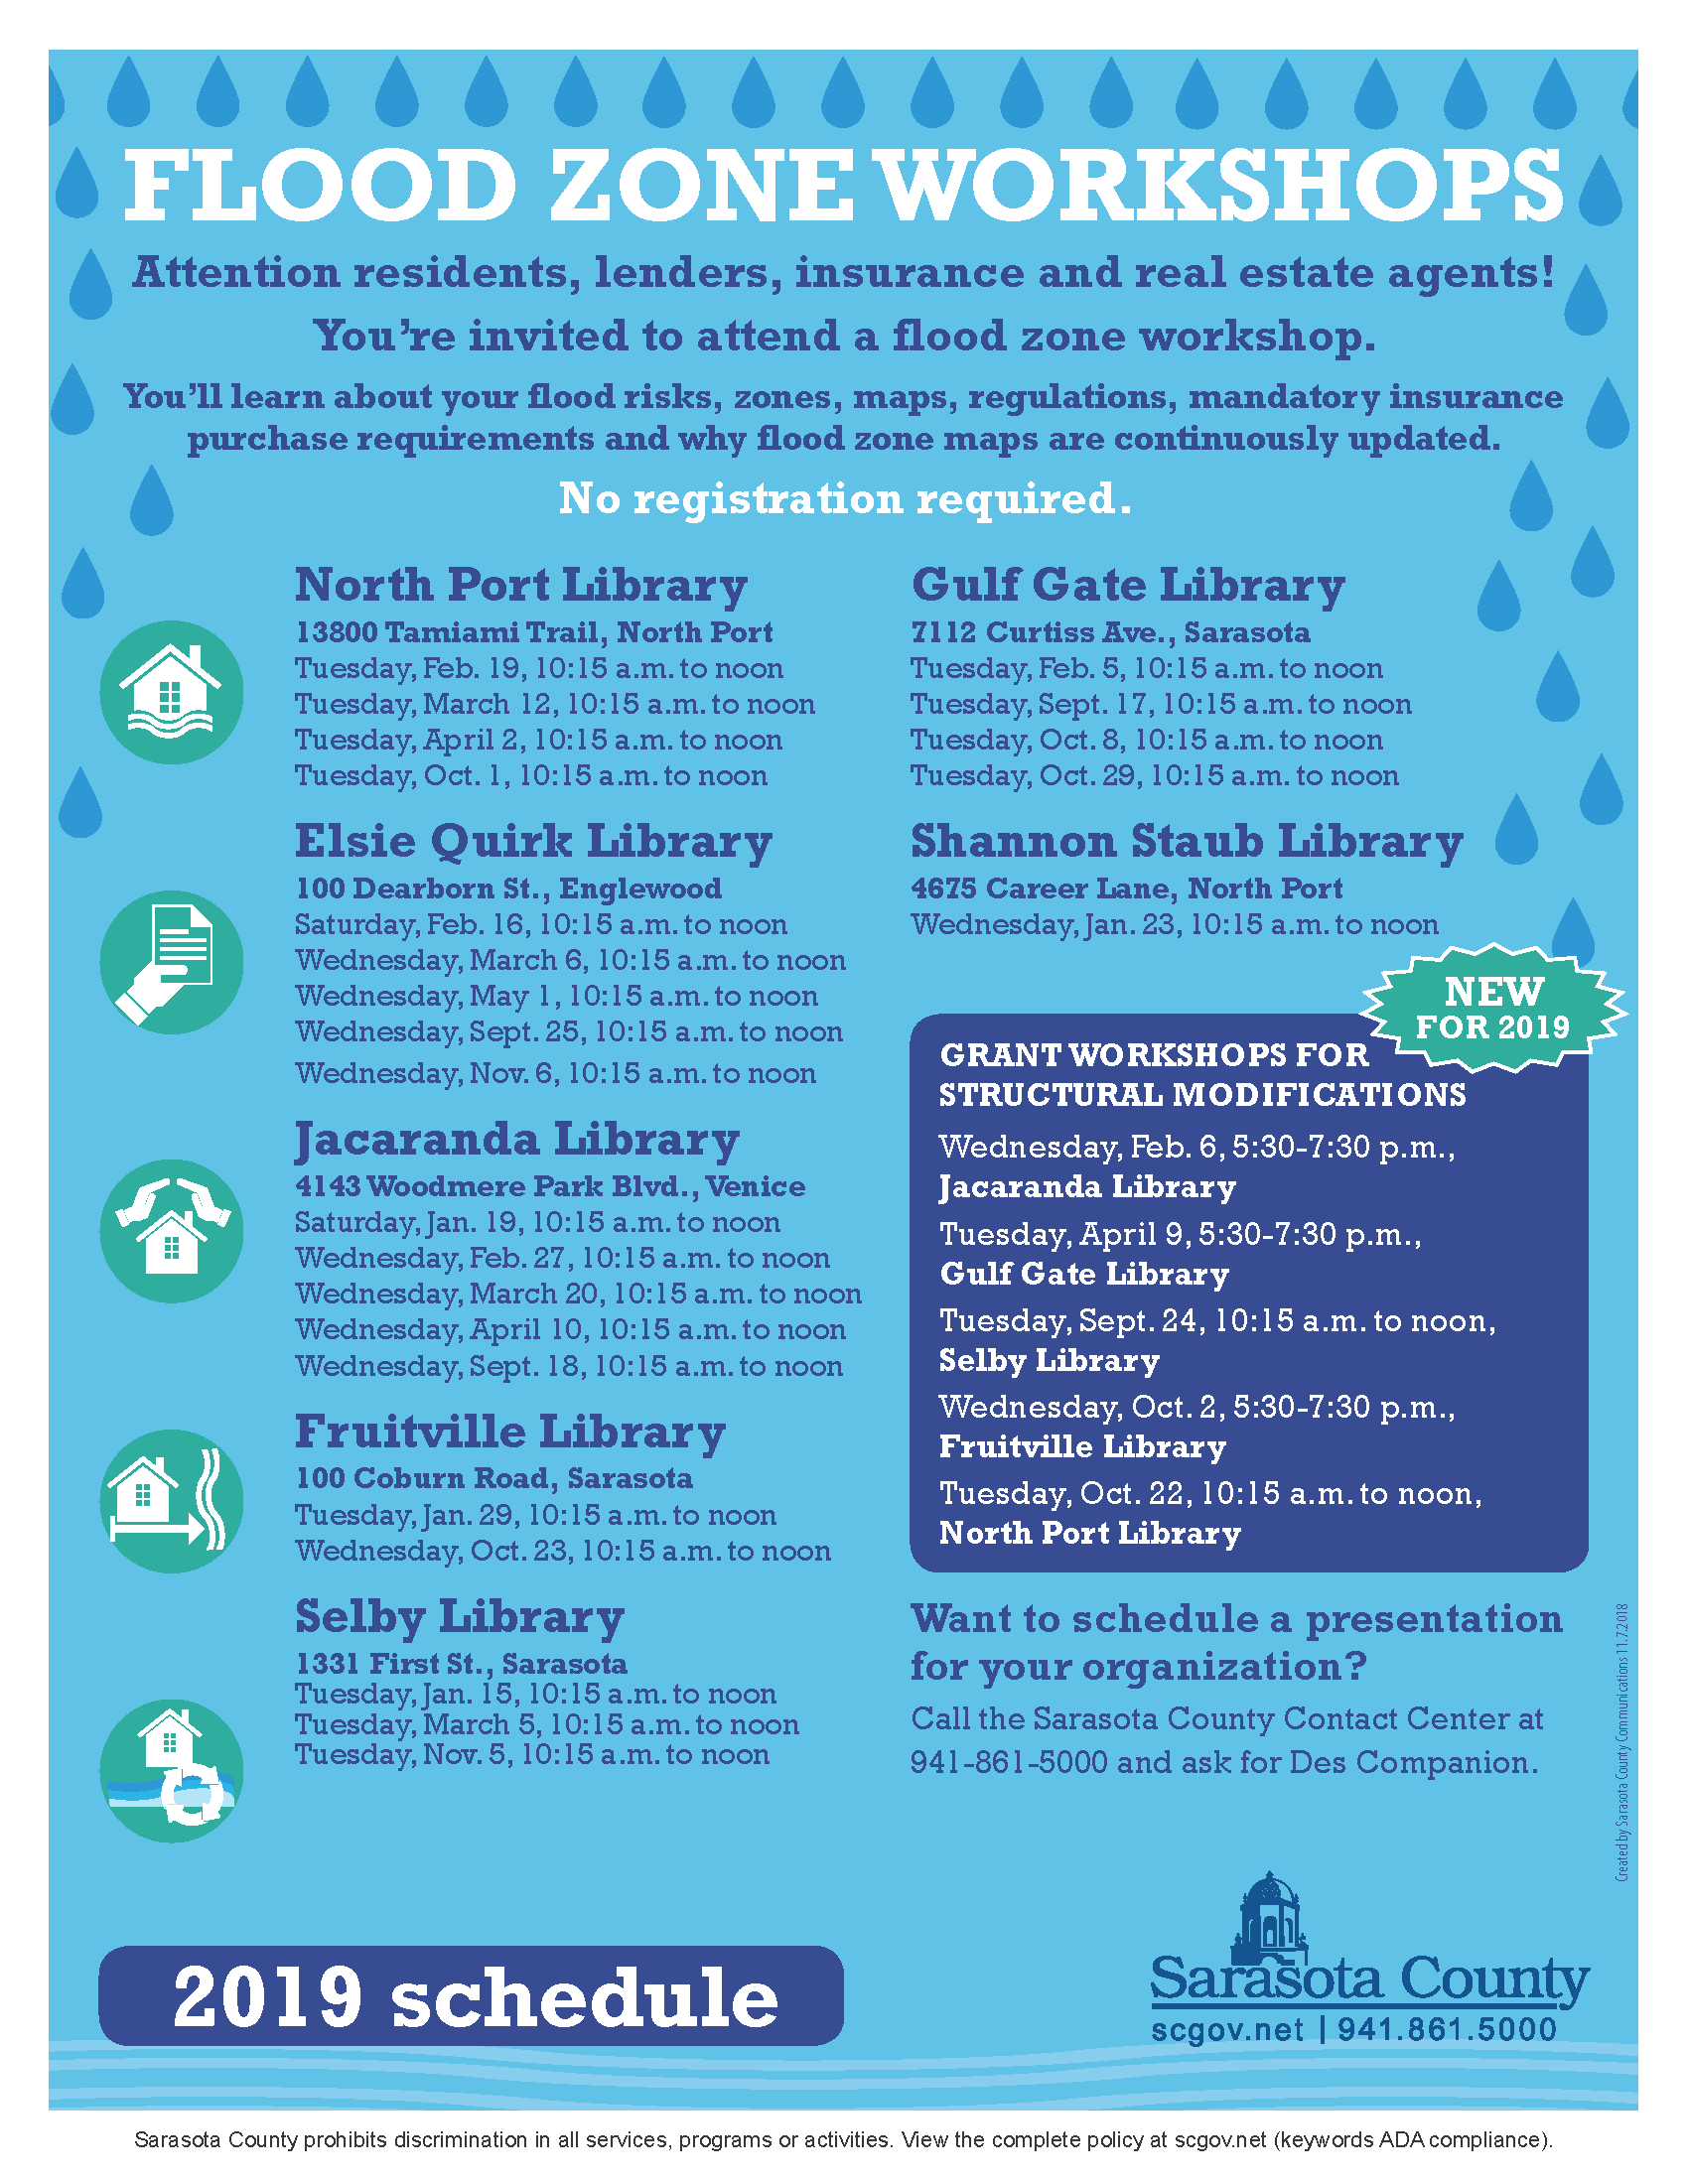 Flood Zone Workshop Flyer_2019